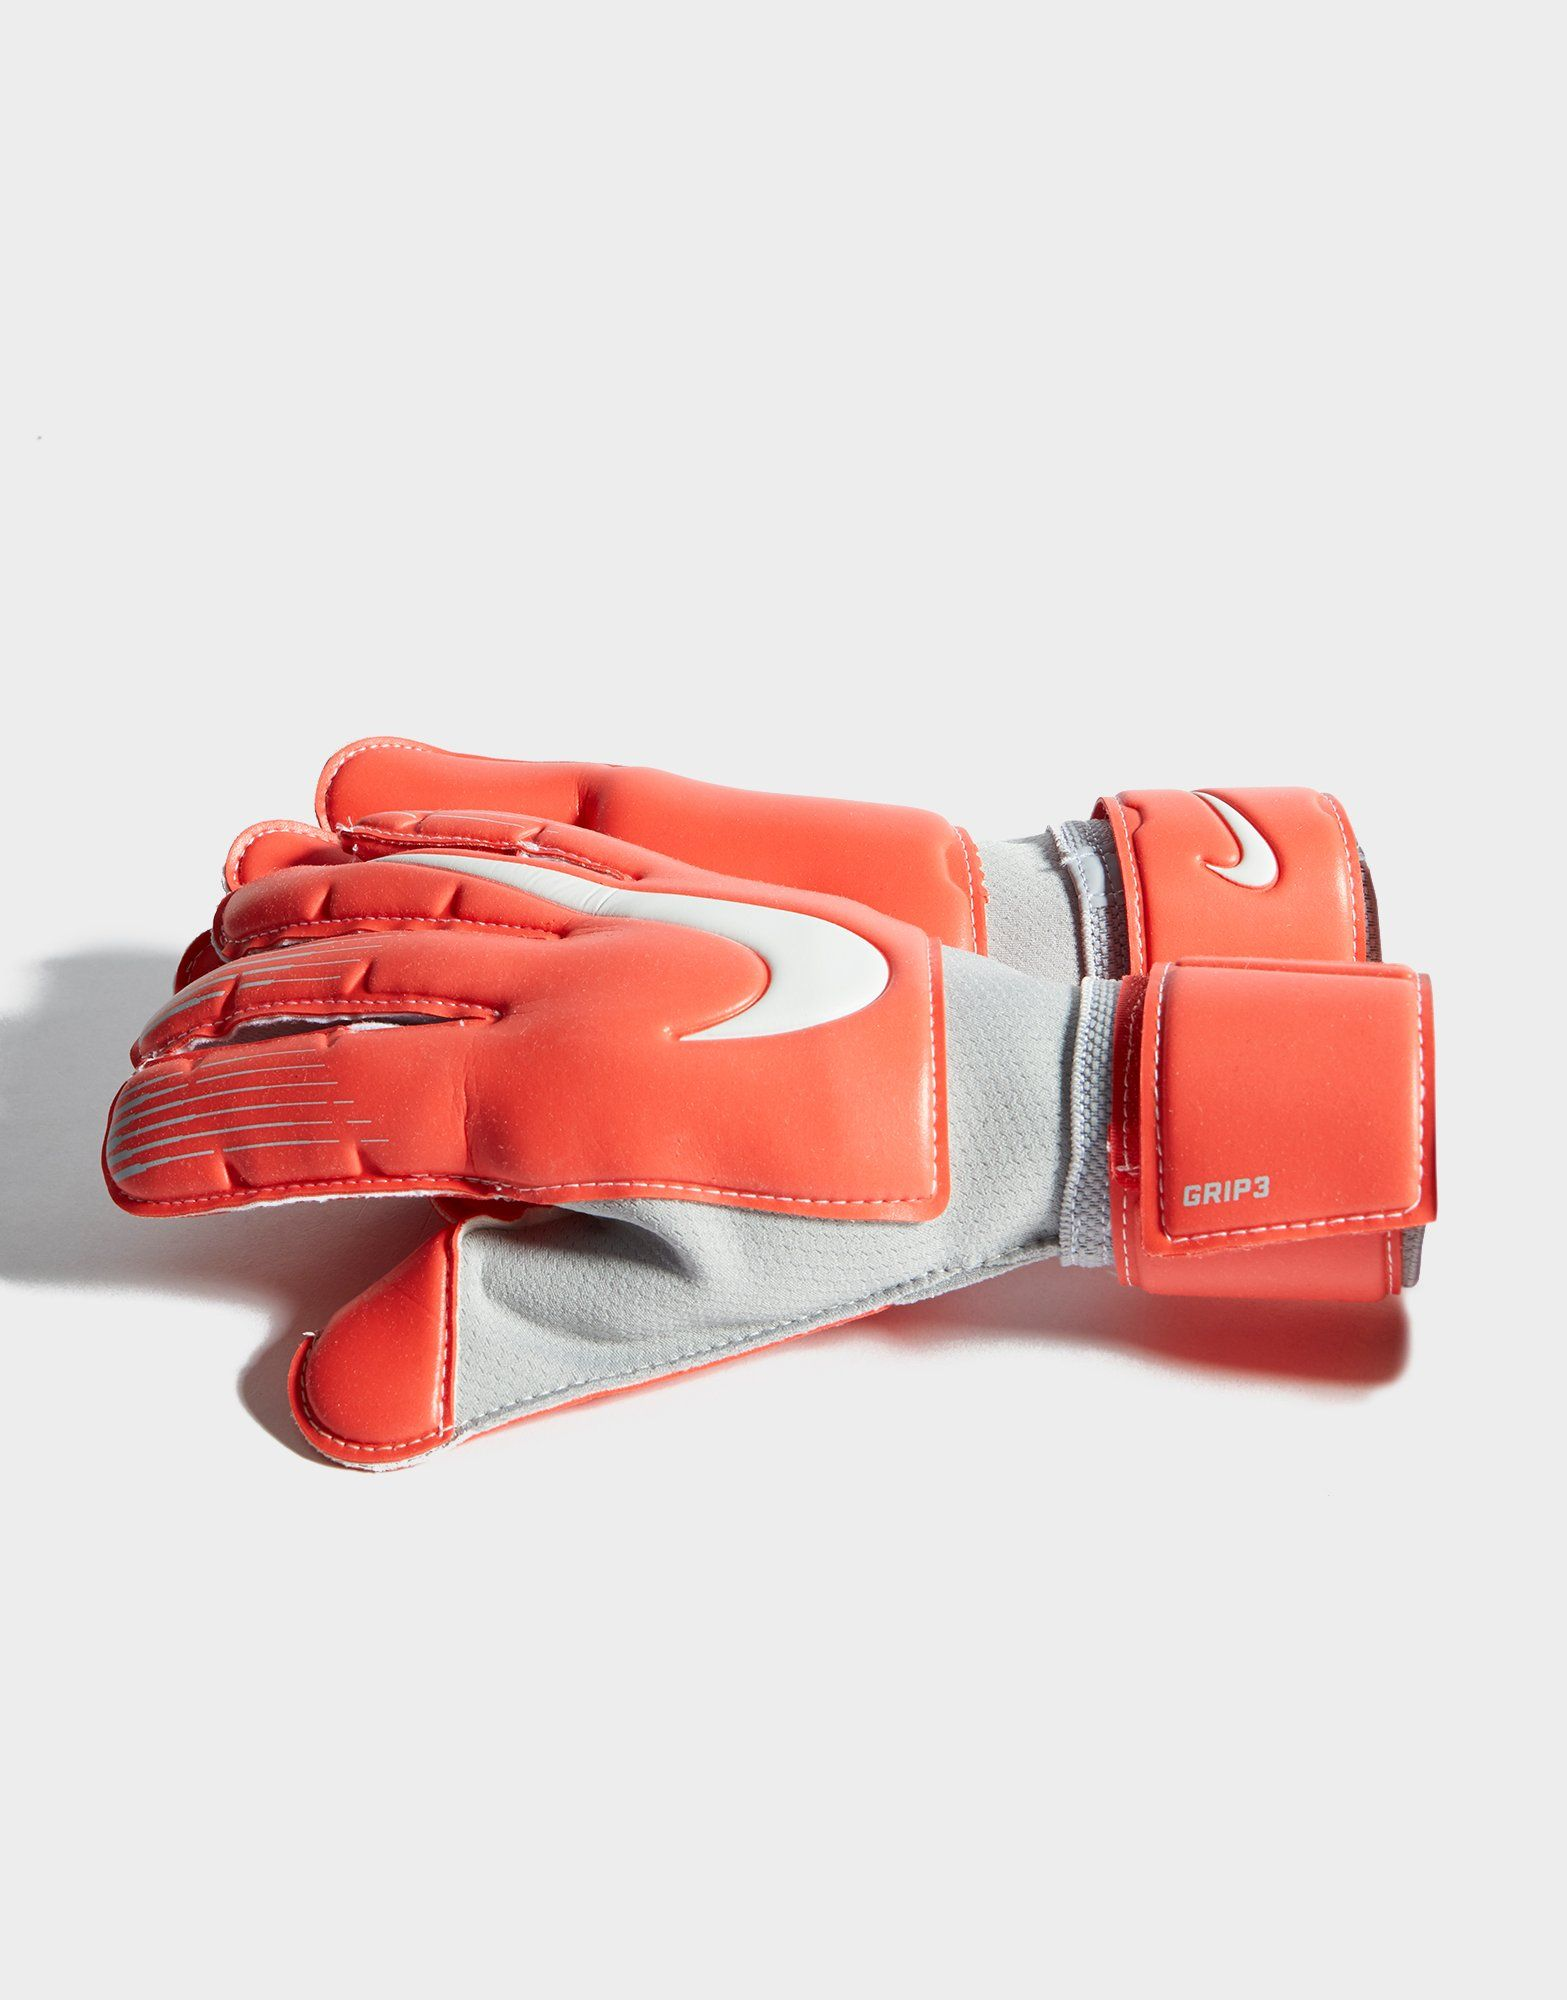 Nike guantes de portero Grip 3 FA 2018